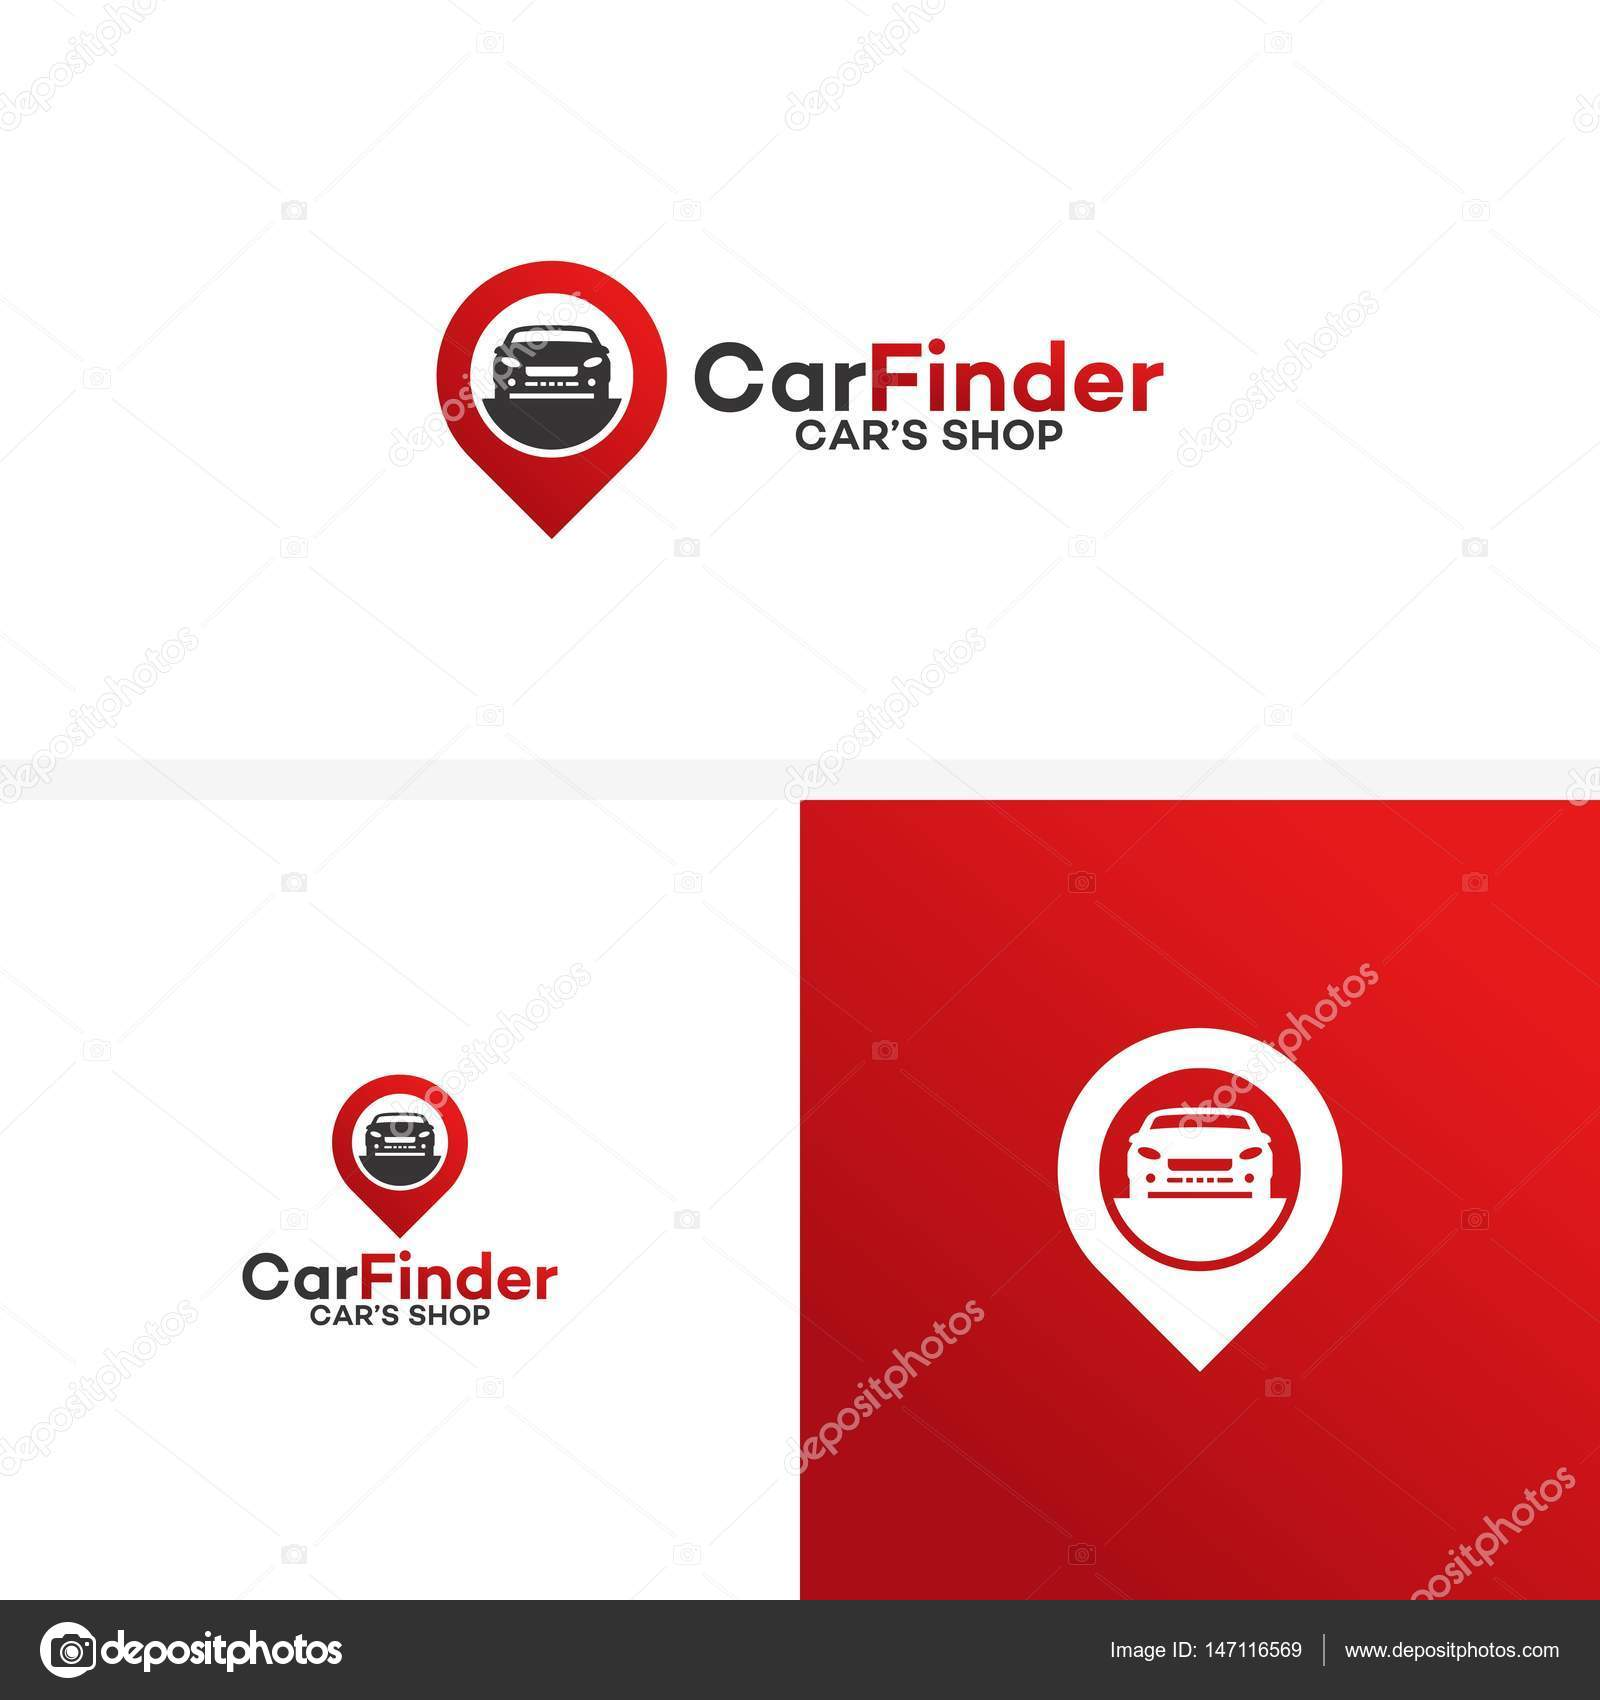 Car Shop Logo Template Design Vector Car Finder Logo Template